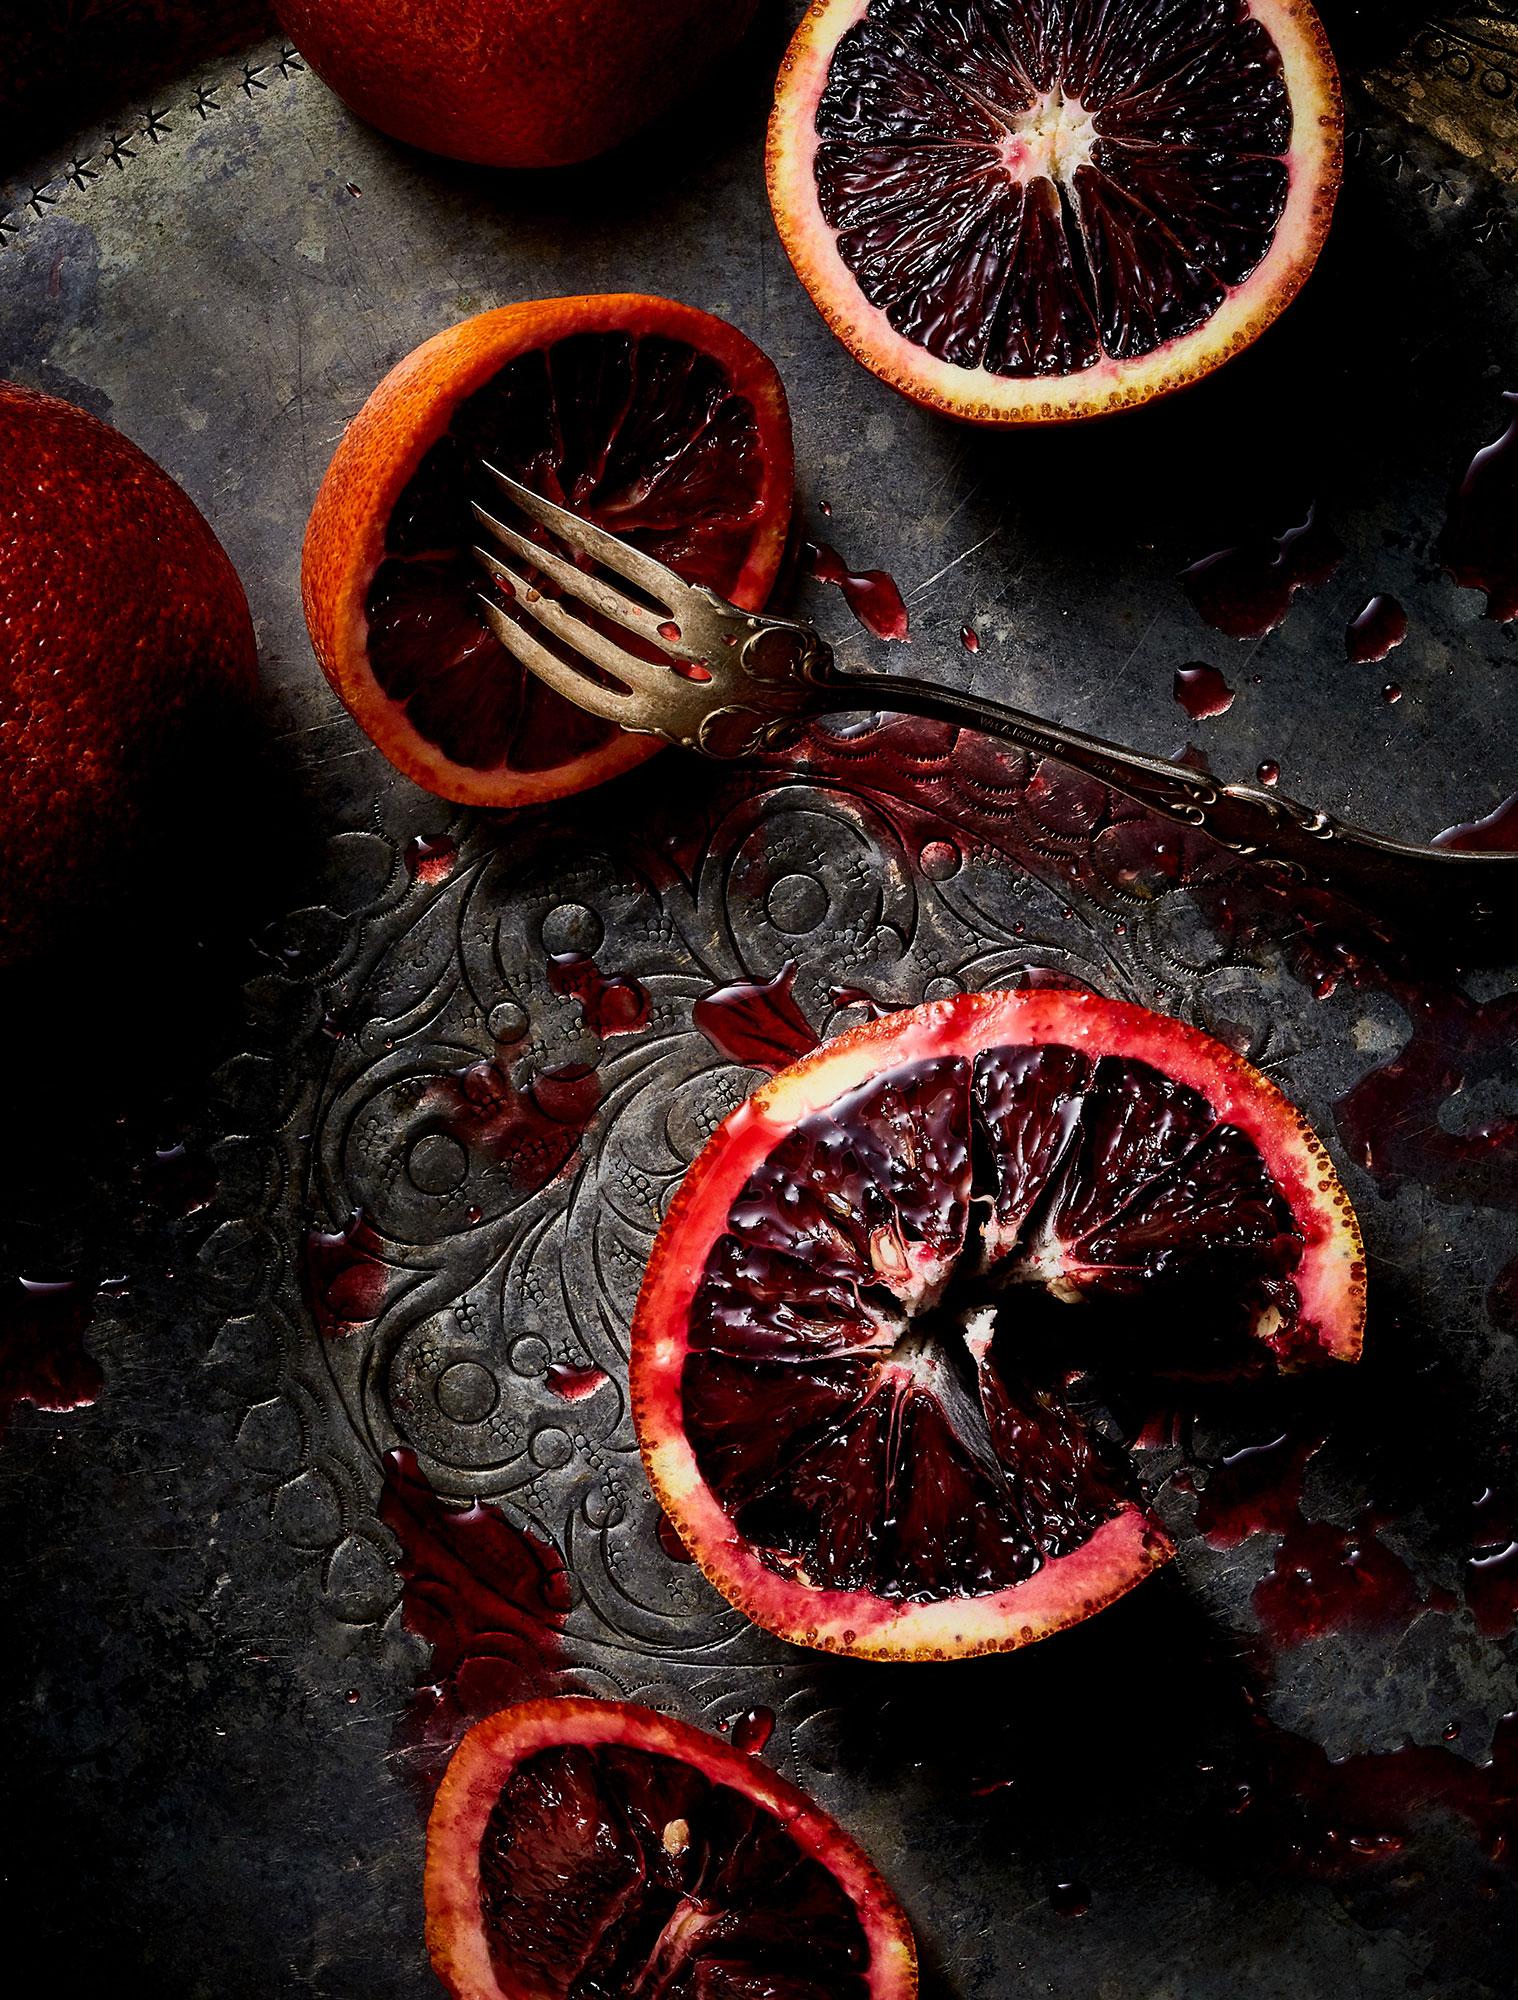 Blood Orange Food styling